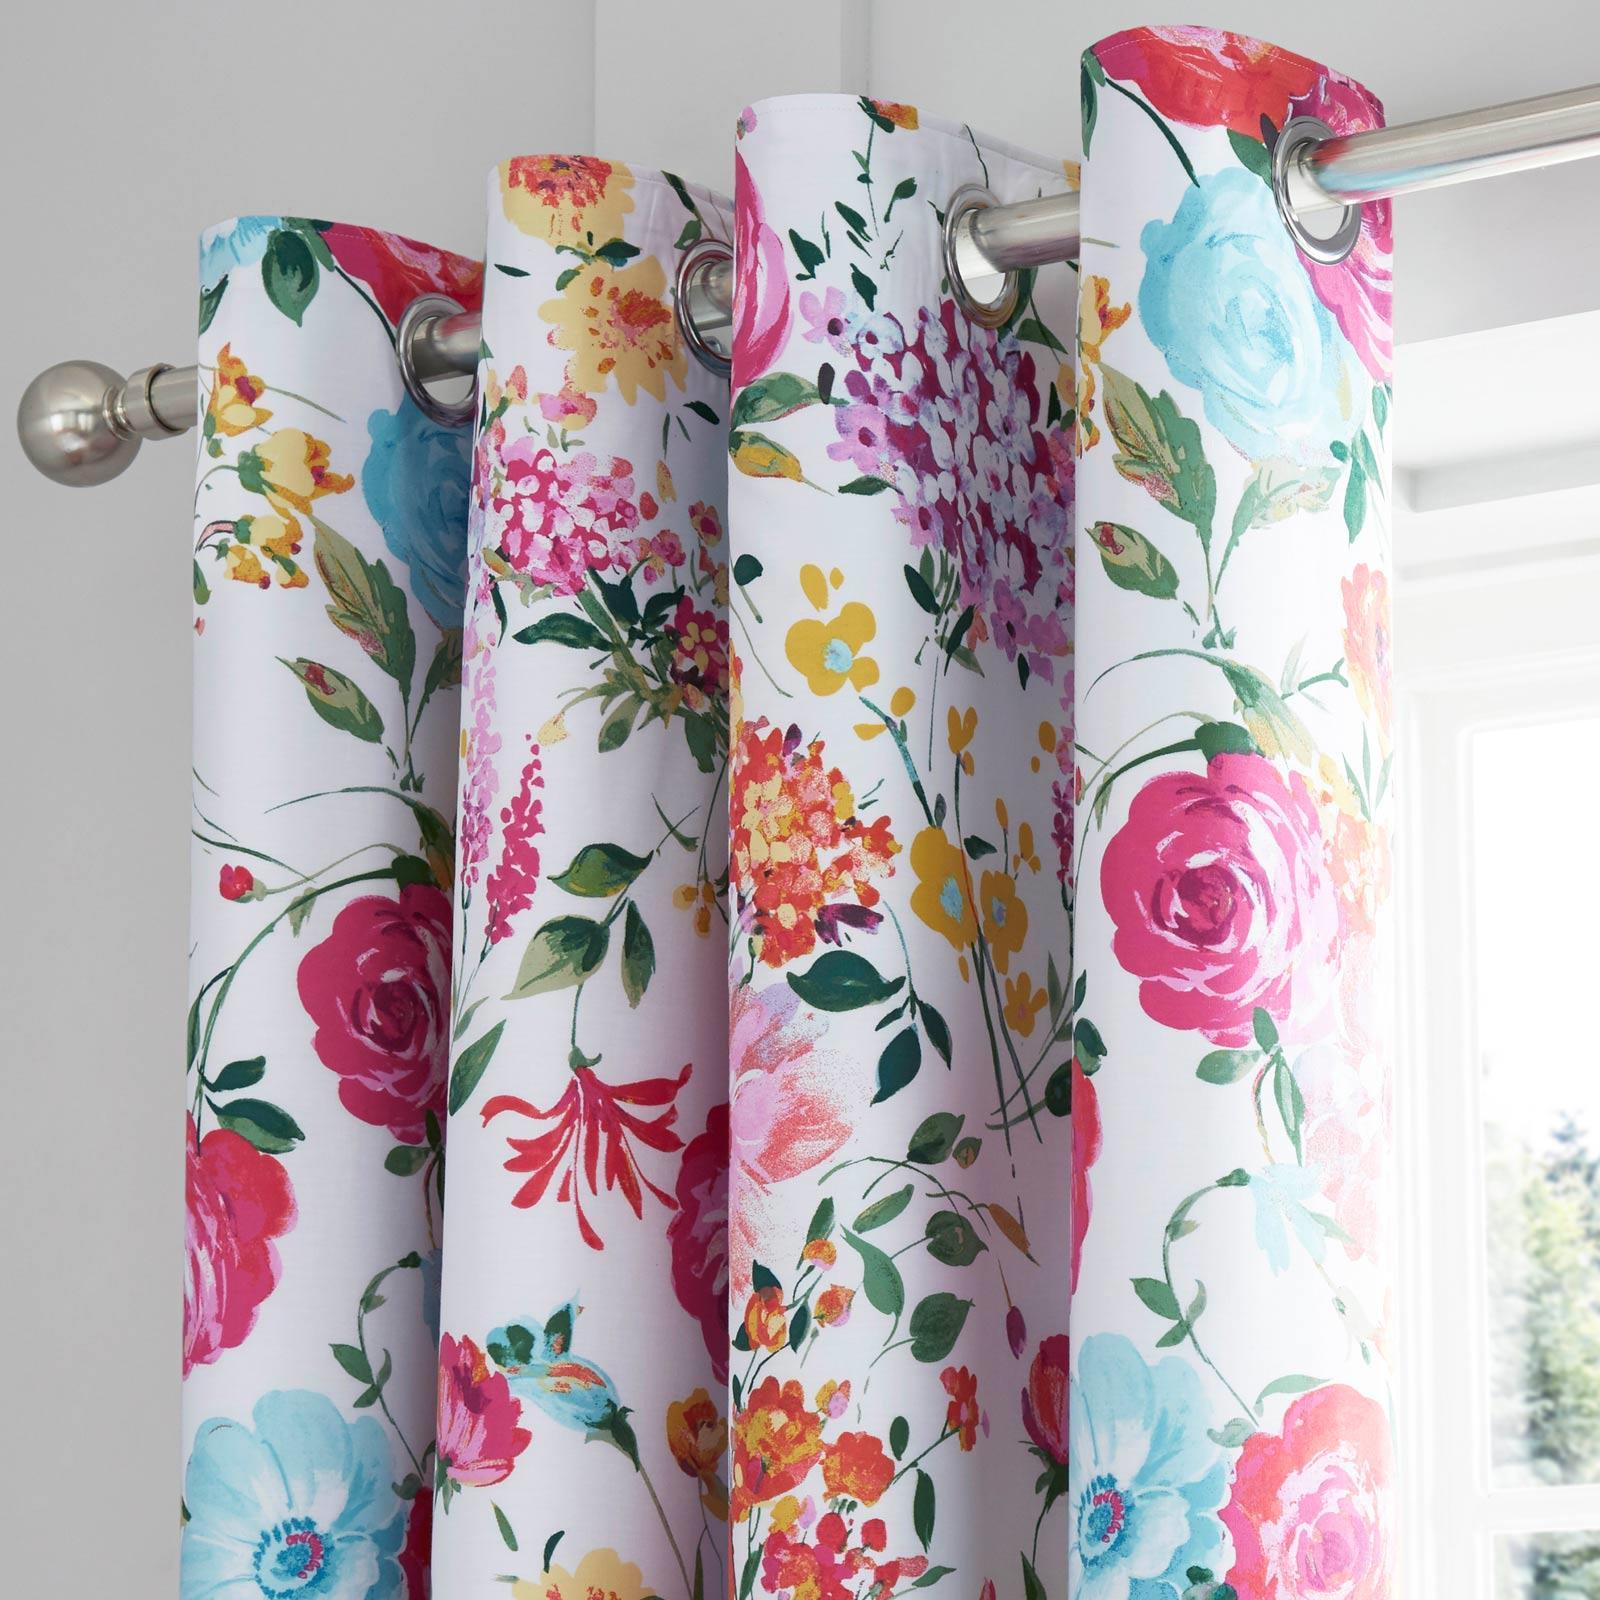 Catherine-Lansfield-Salisbury-Pink-cubierta-del-edredon-edredon-cubre-floral-de-conjuntos-de-cama miniatura 29